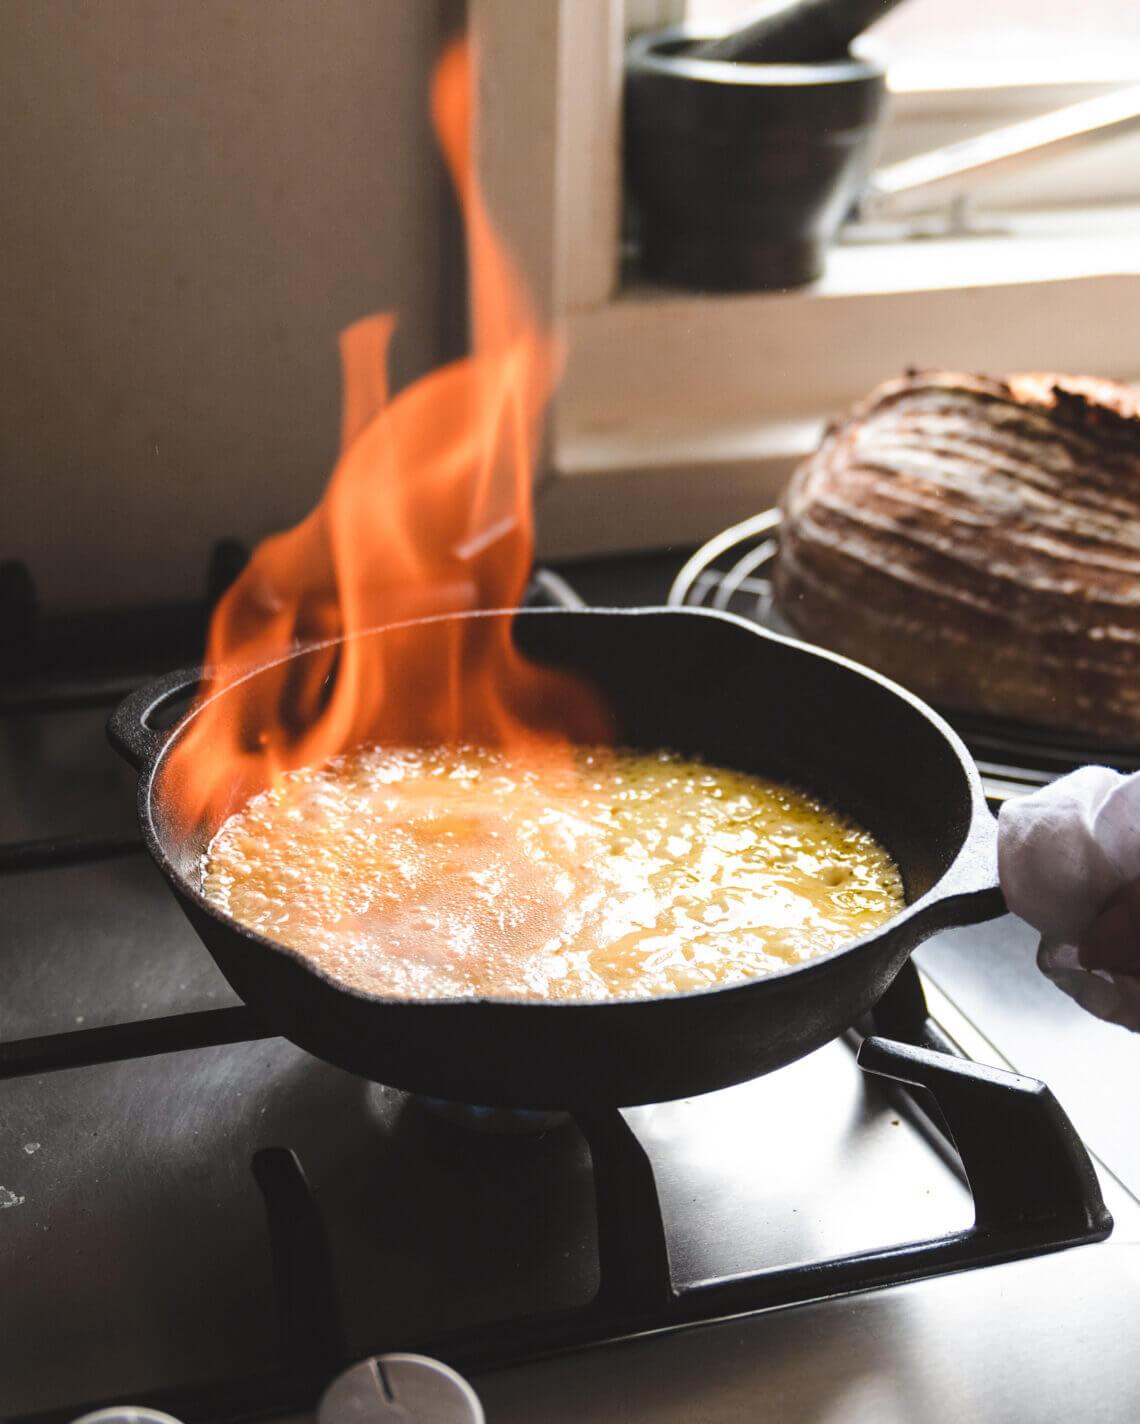 Geflambeerde kaas